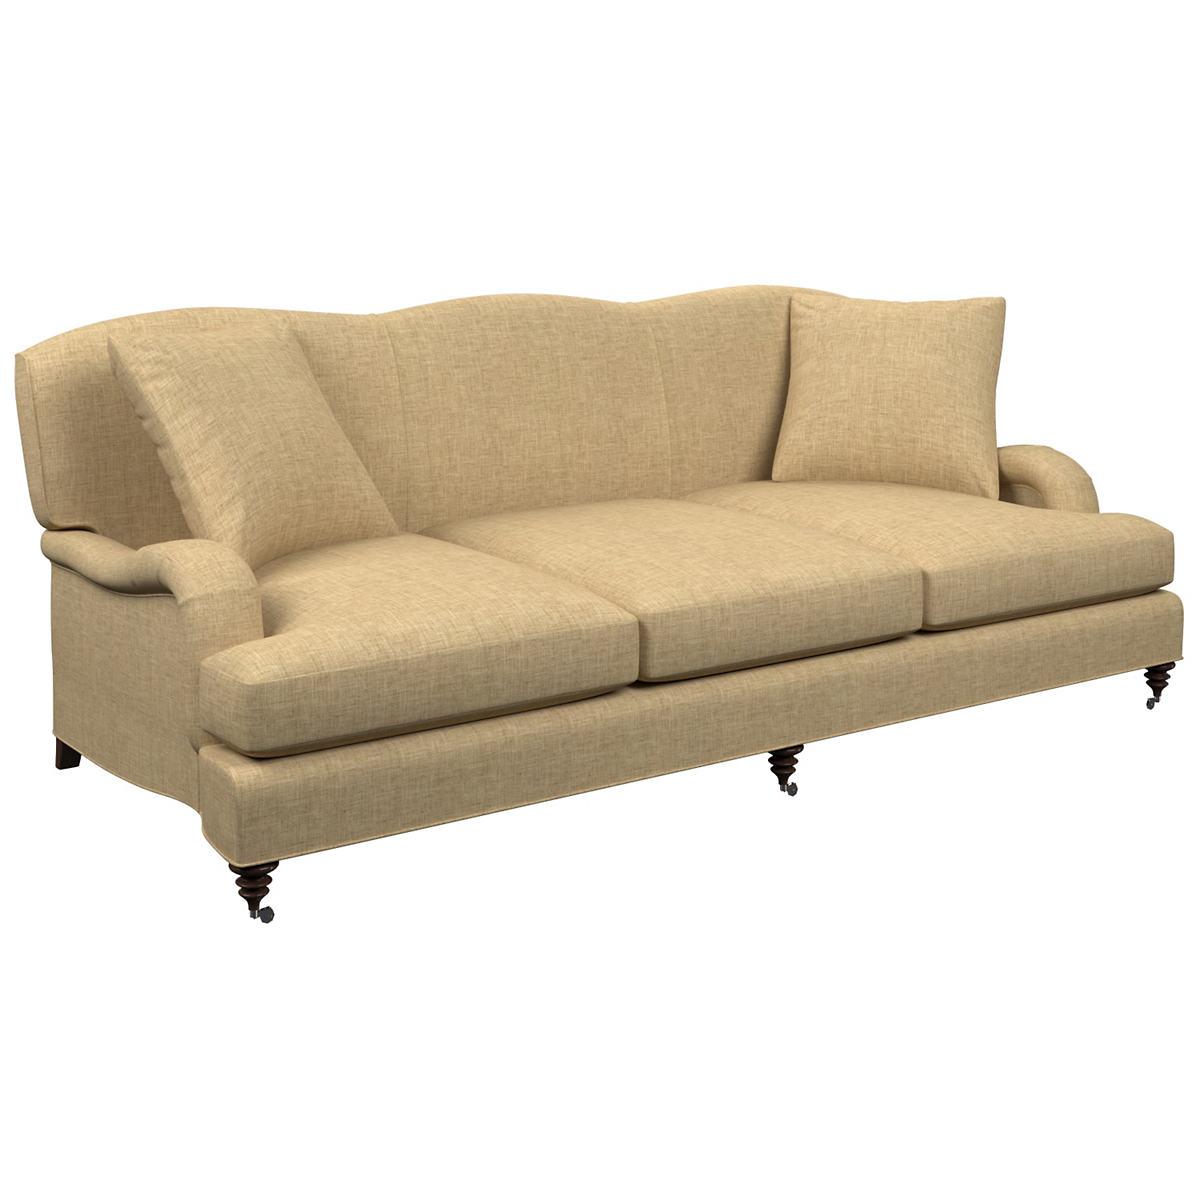 Greylock Natural Litchfield 3 Seater Sofa